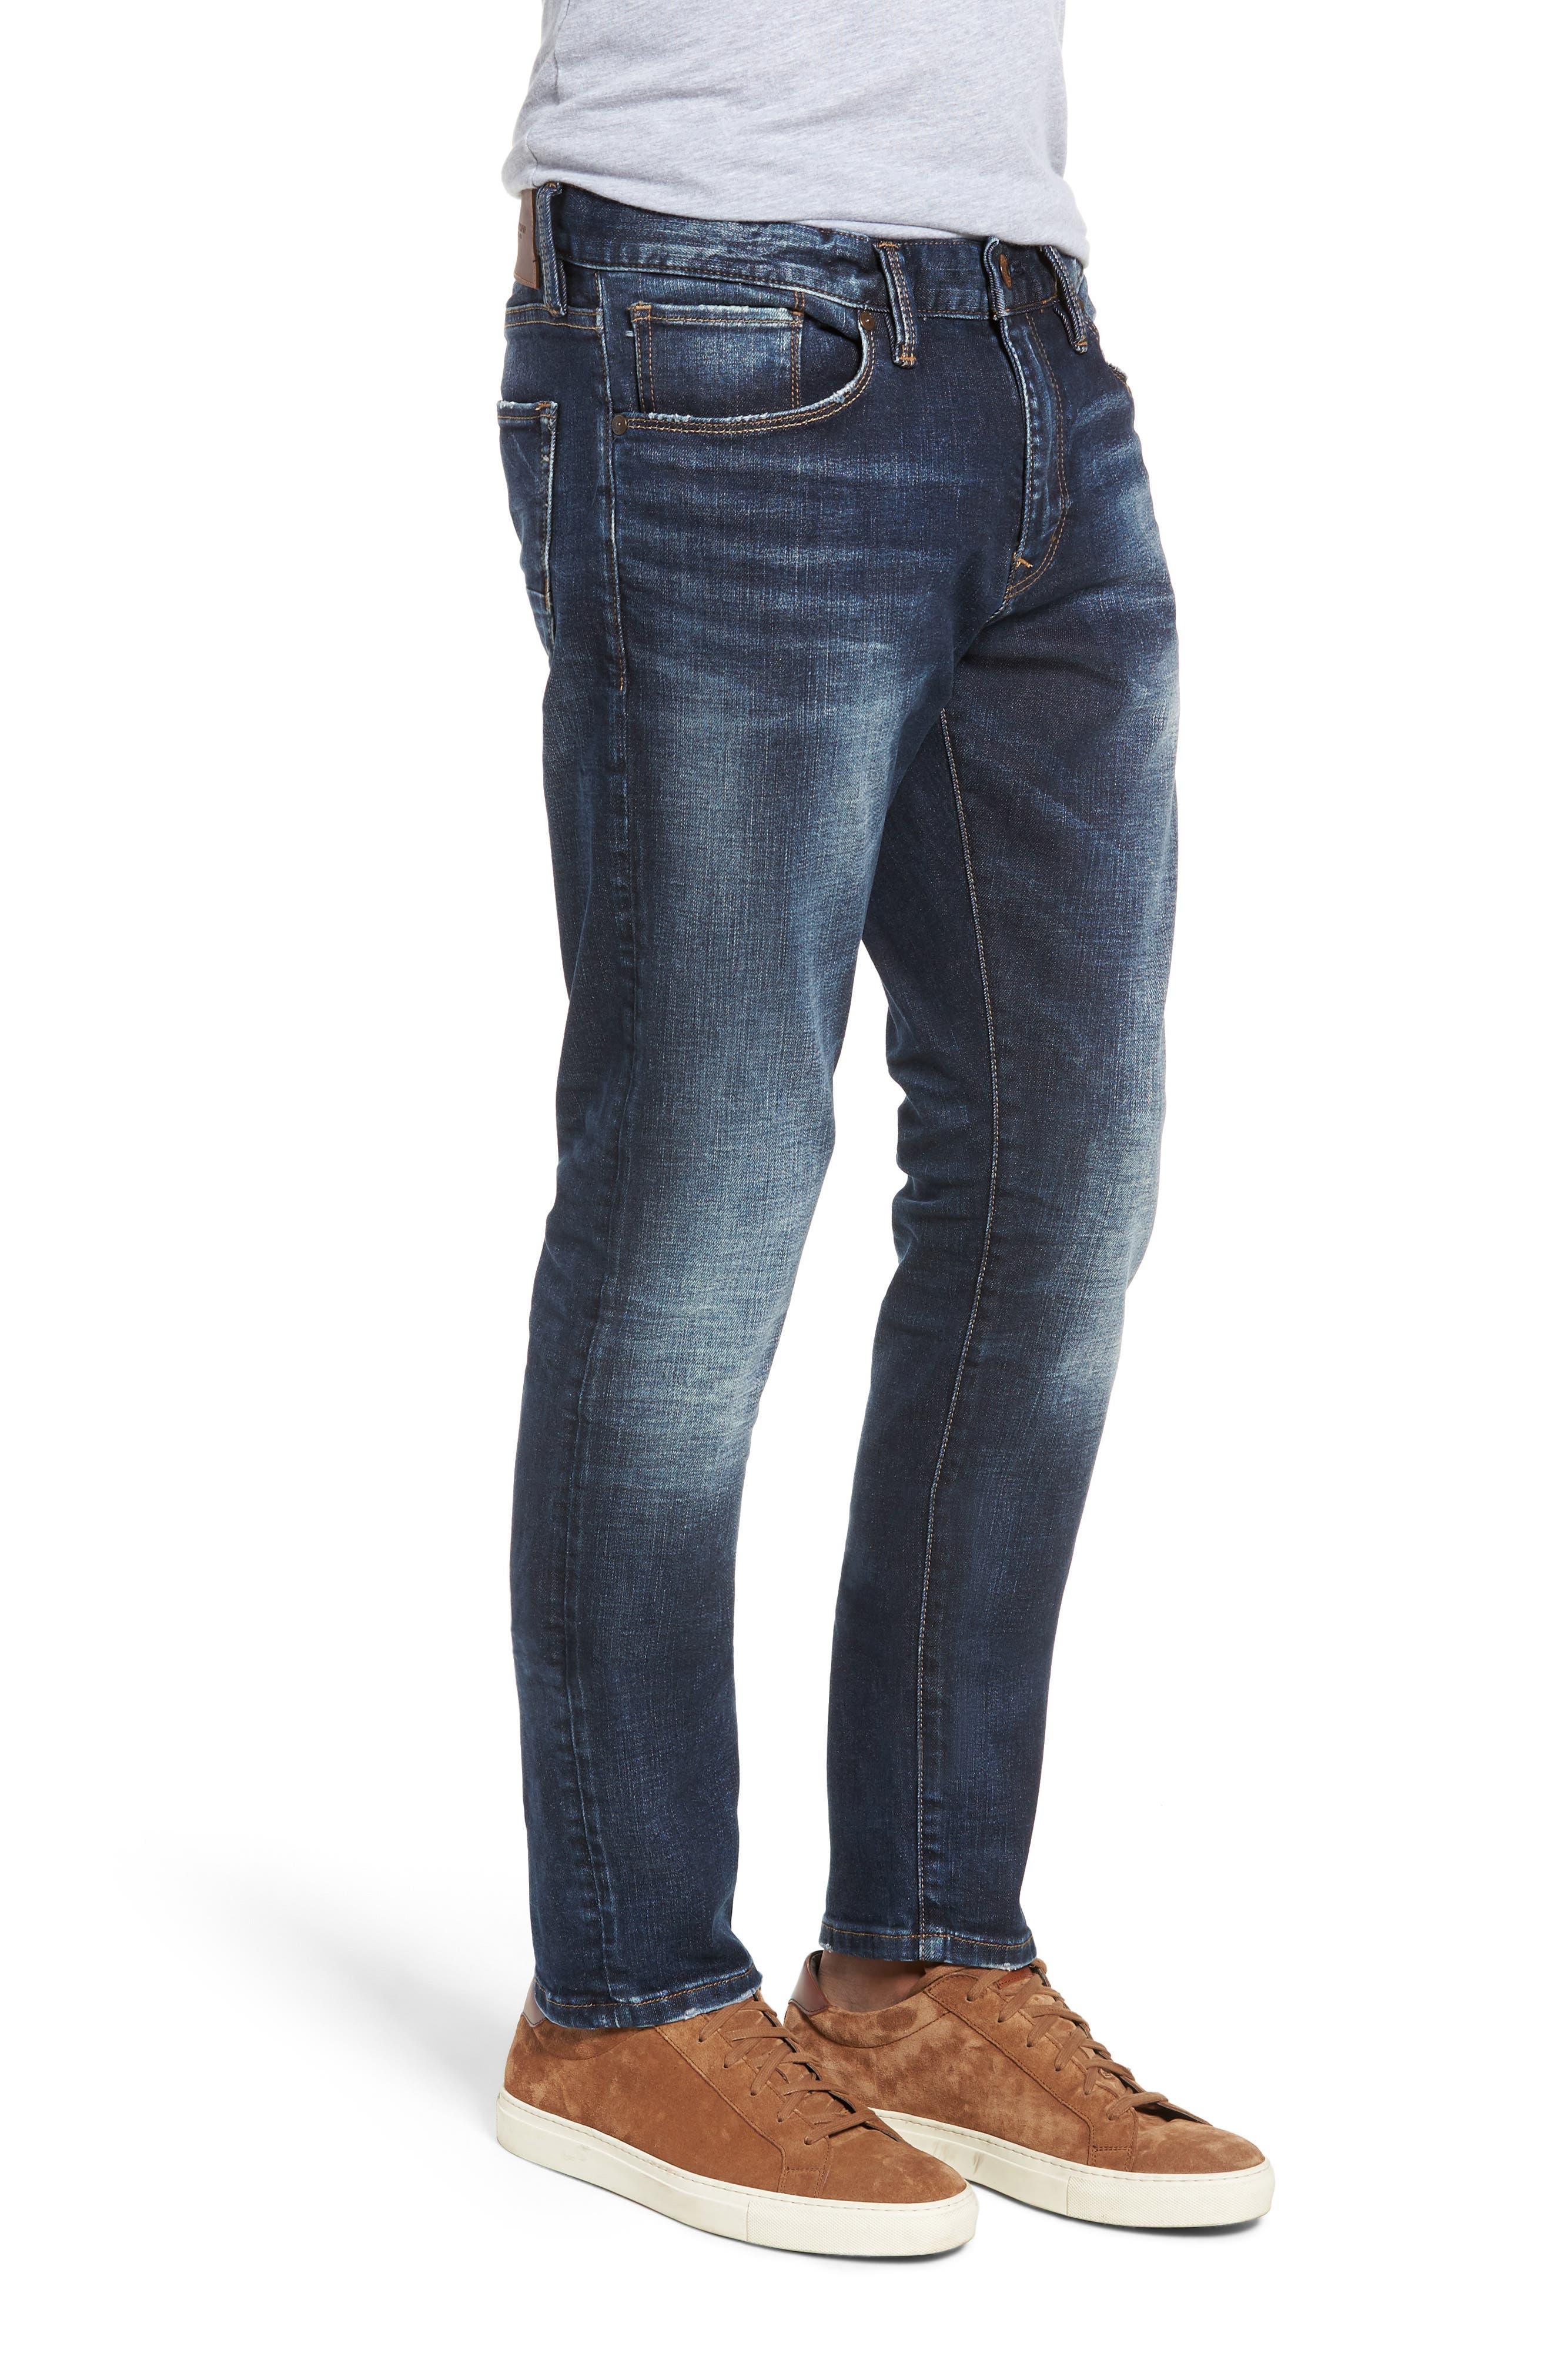 SILVER JEANS CO.,                             Ashdown Slim Straight Fit Jeans,                             Alternate thumbnail 3, color,                             INDIGO